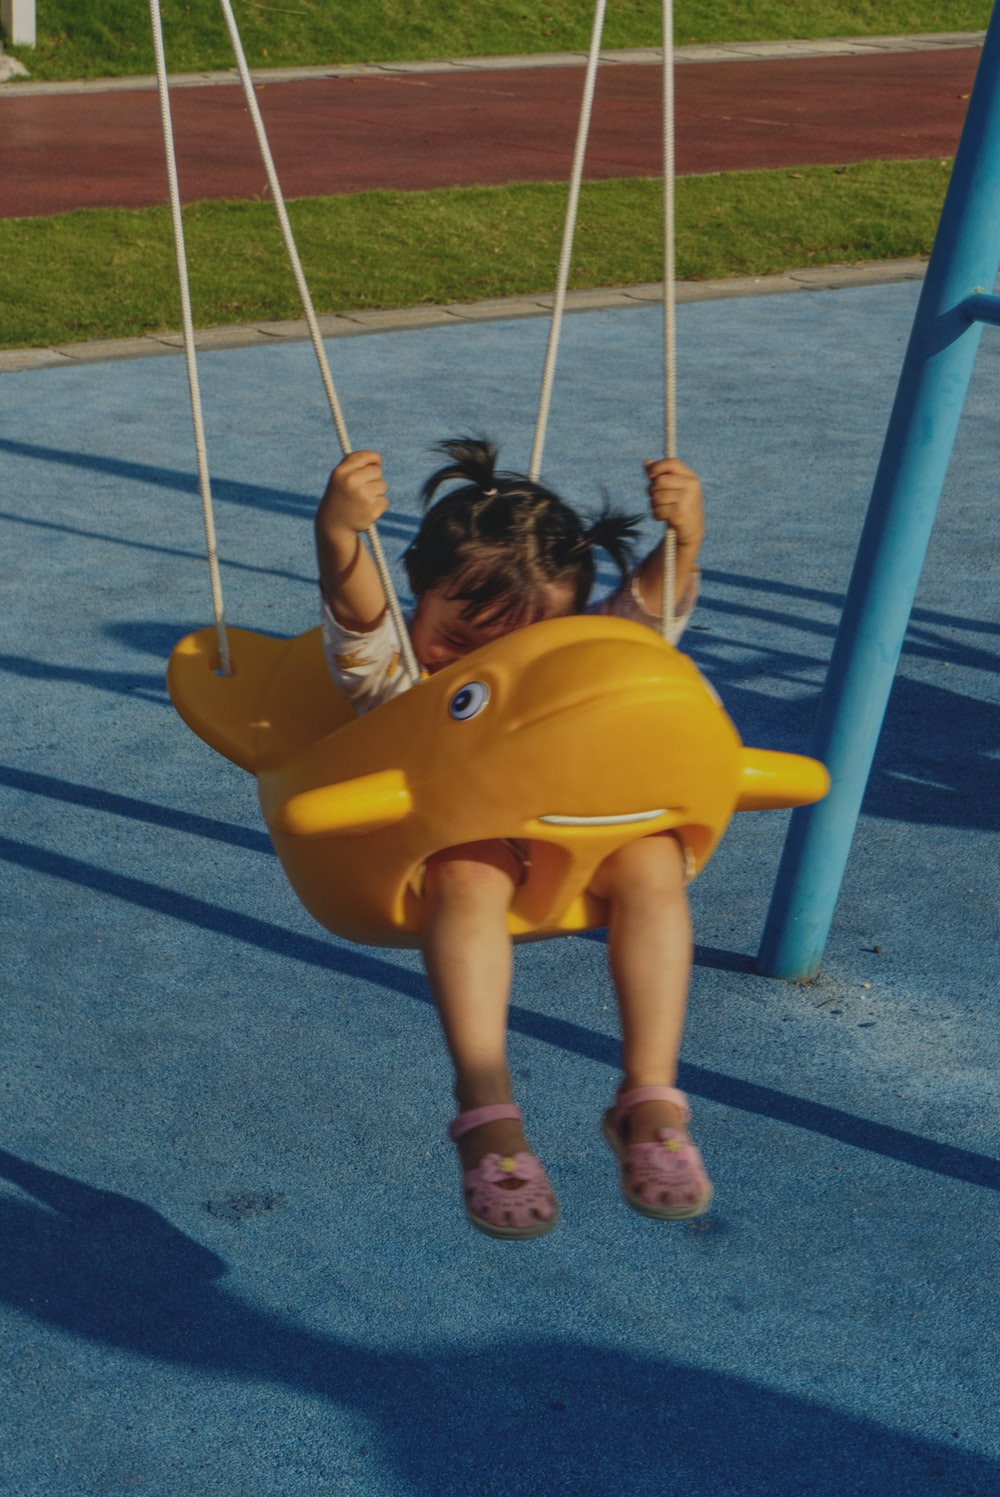 girl in yellow shirt sitting on yellow swing